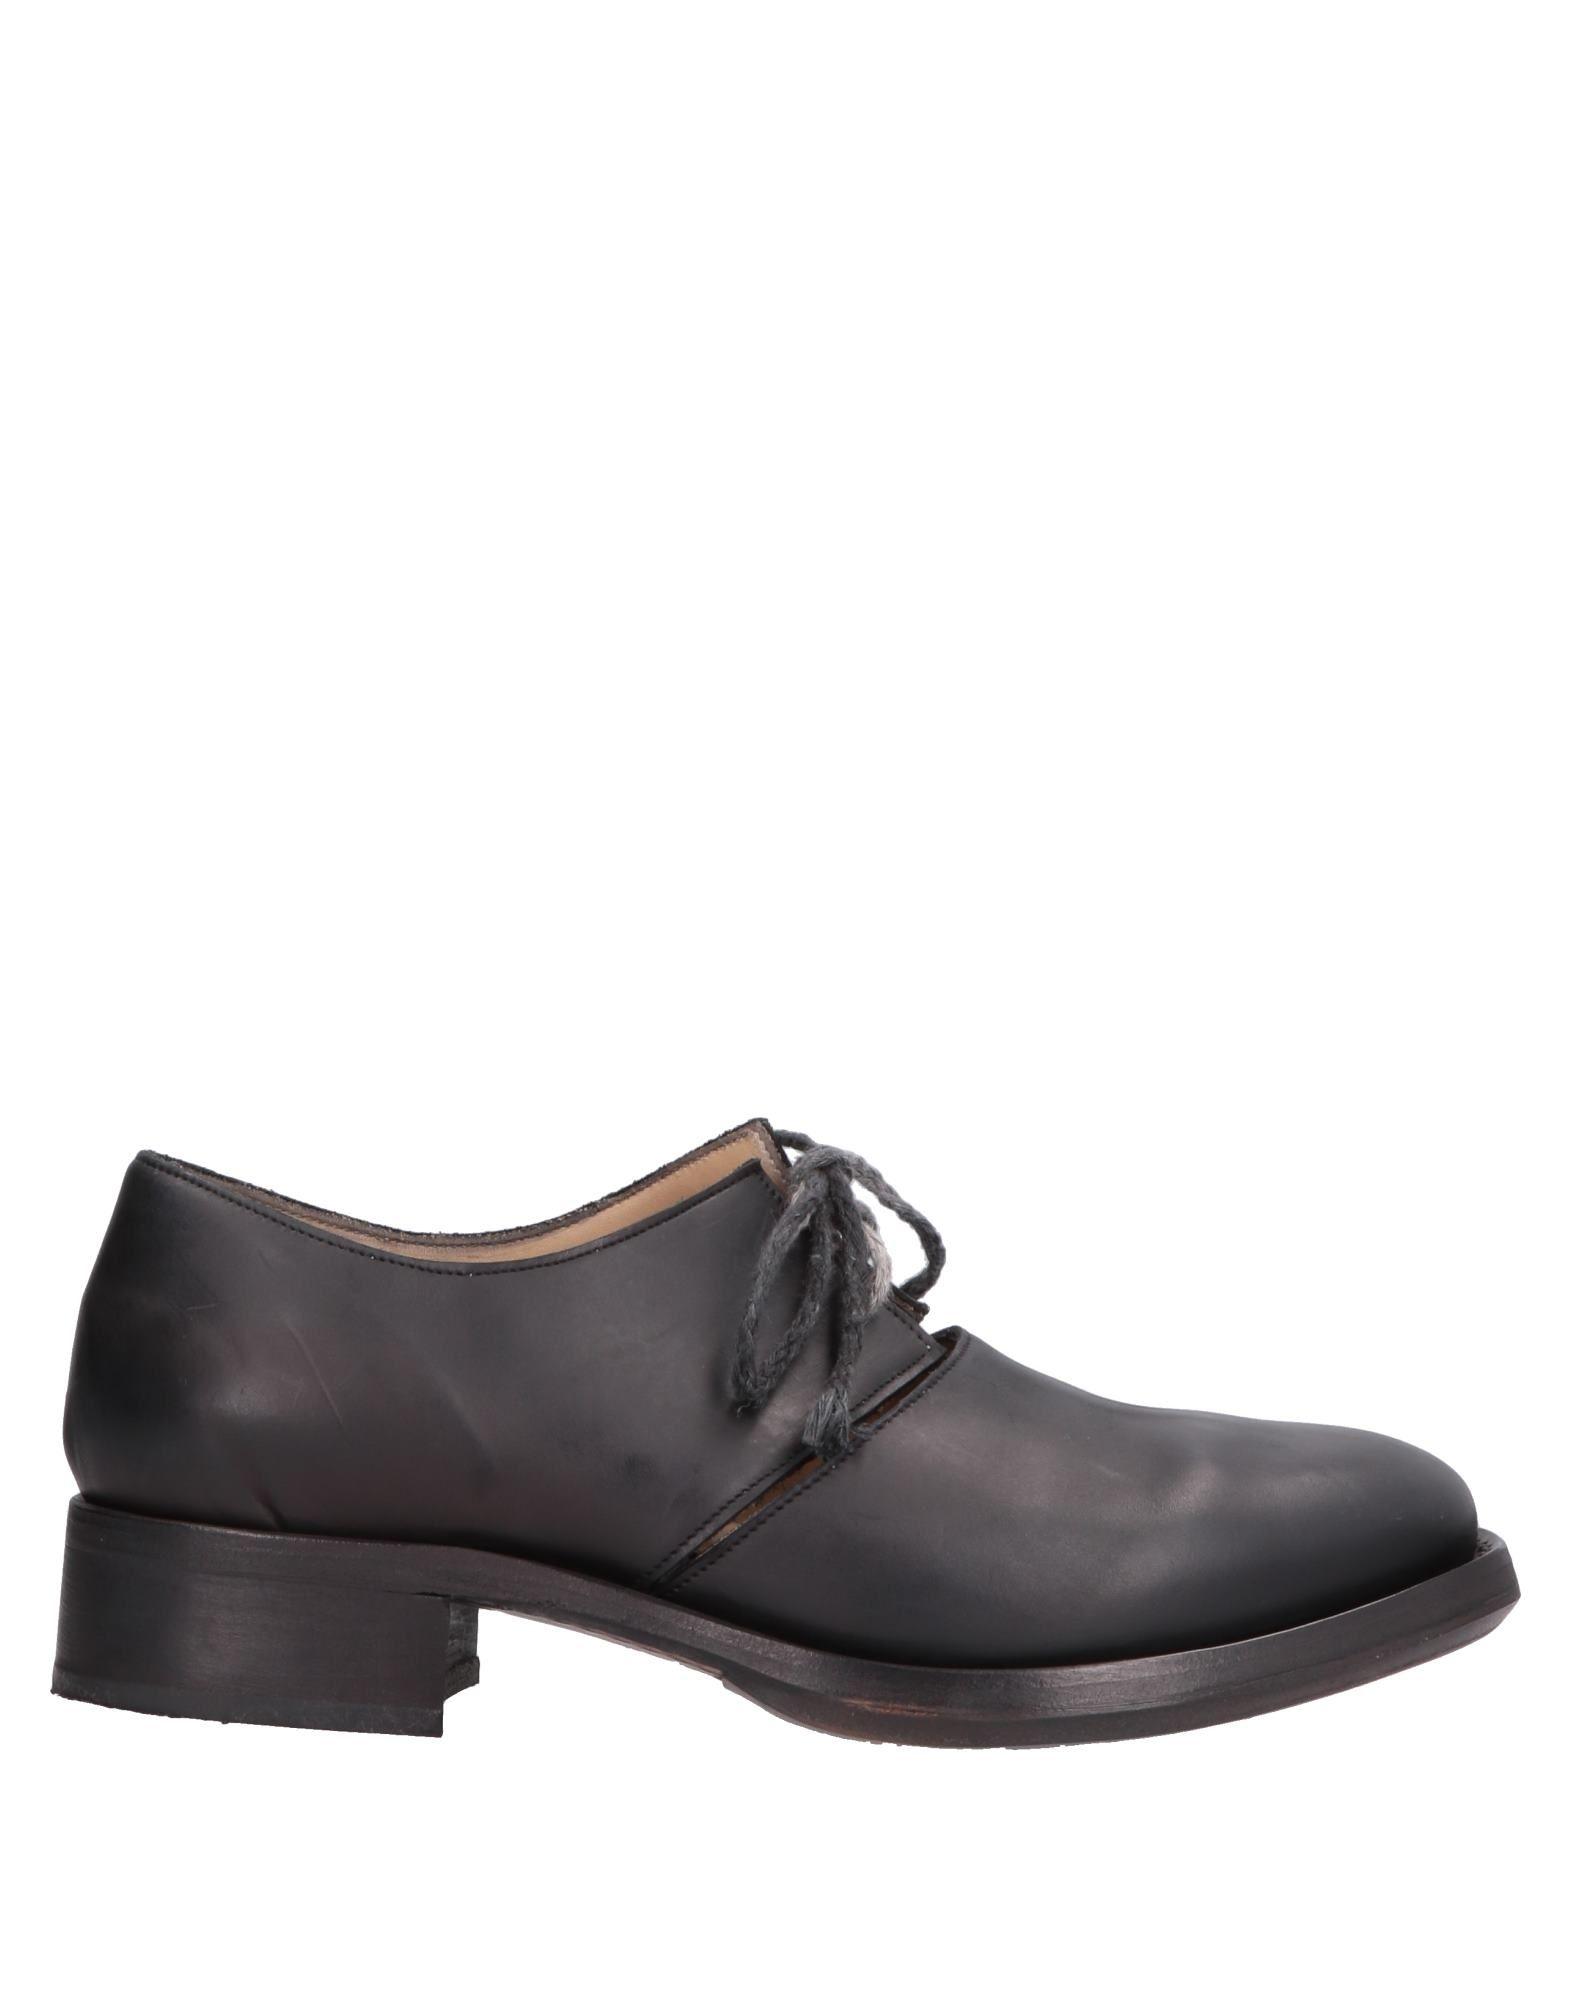 Фото - CHEREVICHKIOTVICHKI Обувь на шнурках обувь на высокой платформе dkny